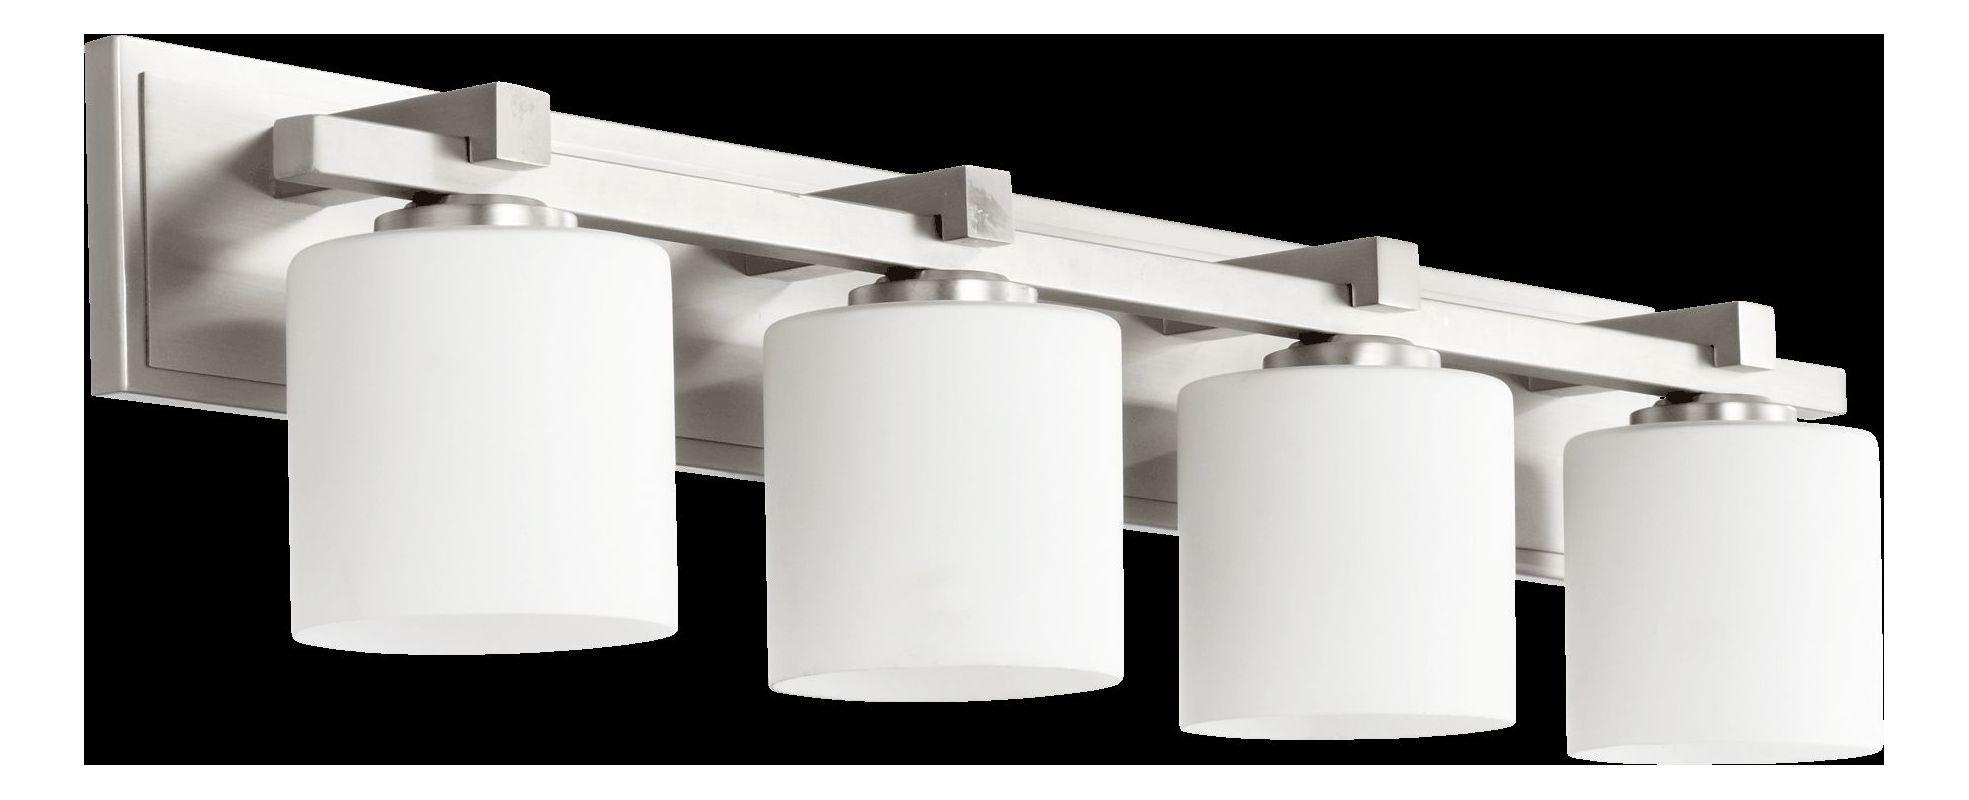 Quorum International 5369-4 4 Light Bathroom Vanity Light with Satin